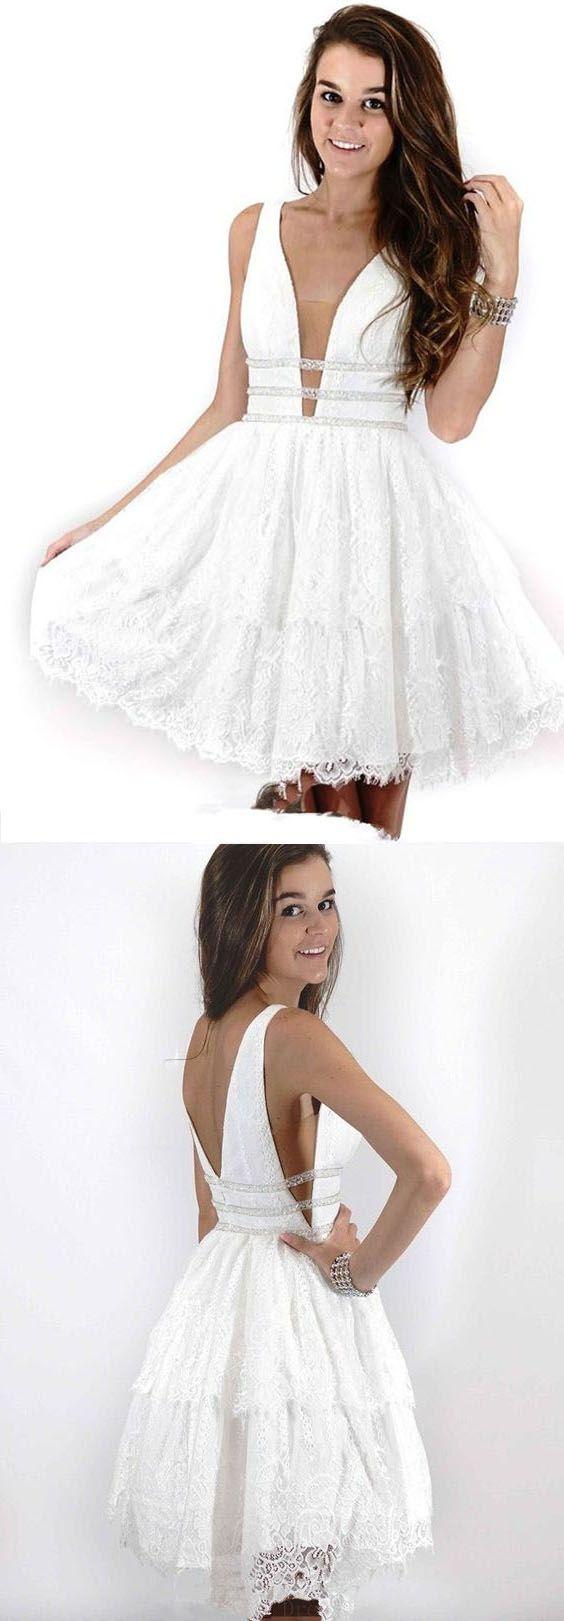 Lace White Prom Dresses Lacewhitepromdresses Prom Dresses 2018 Promdresses2018 Lace Prom Prom Dresses Short Cheap Short Prom Dresses White Lace Prom Dress [ 1621 x 564 Pixel ]